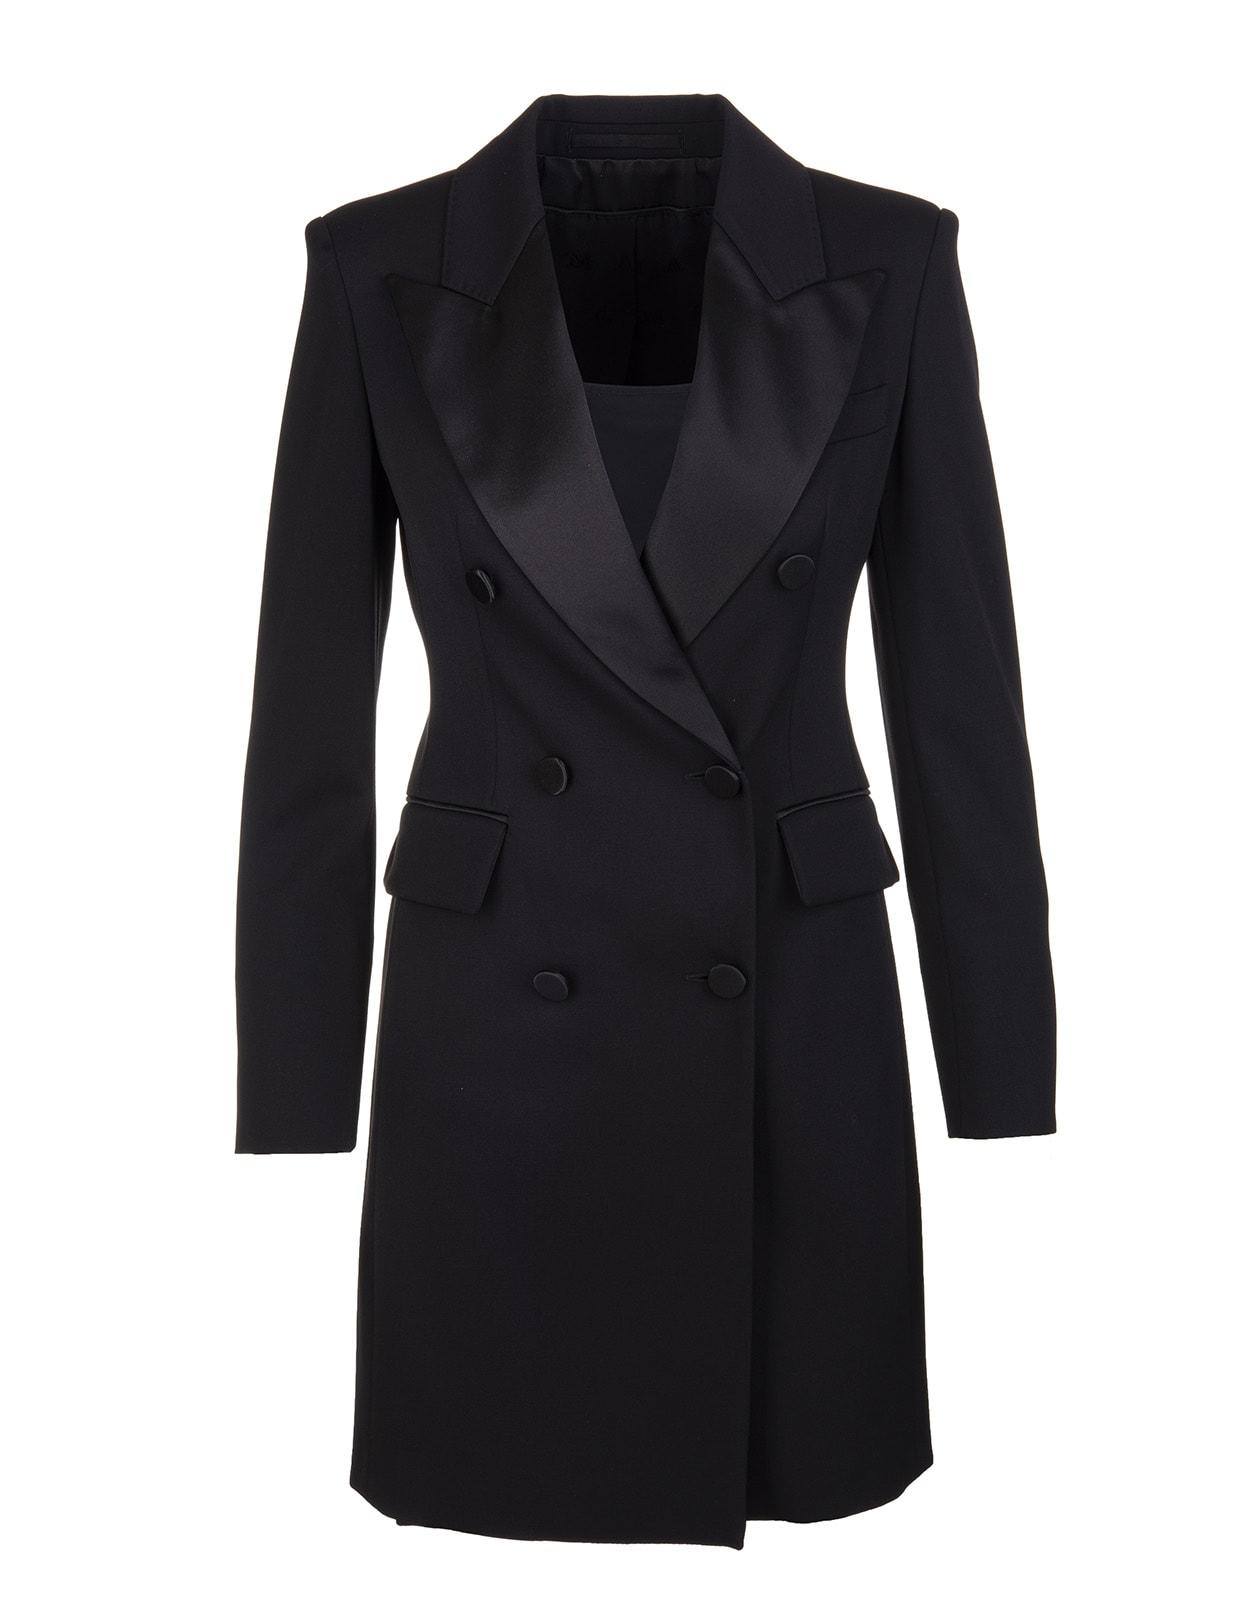 Black Petali Short Dress Max Mara Pianoforte